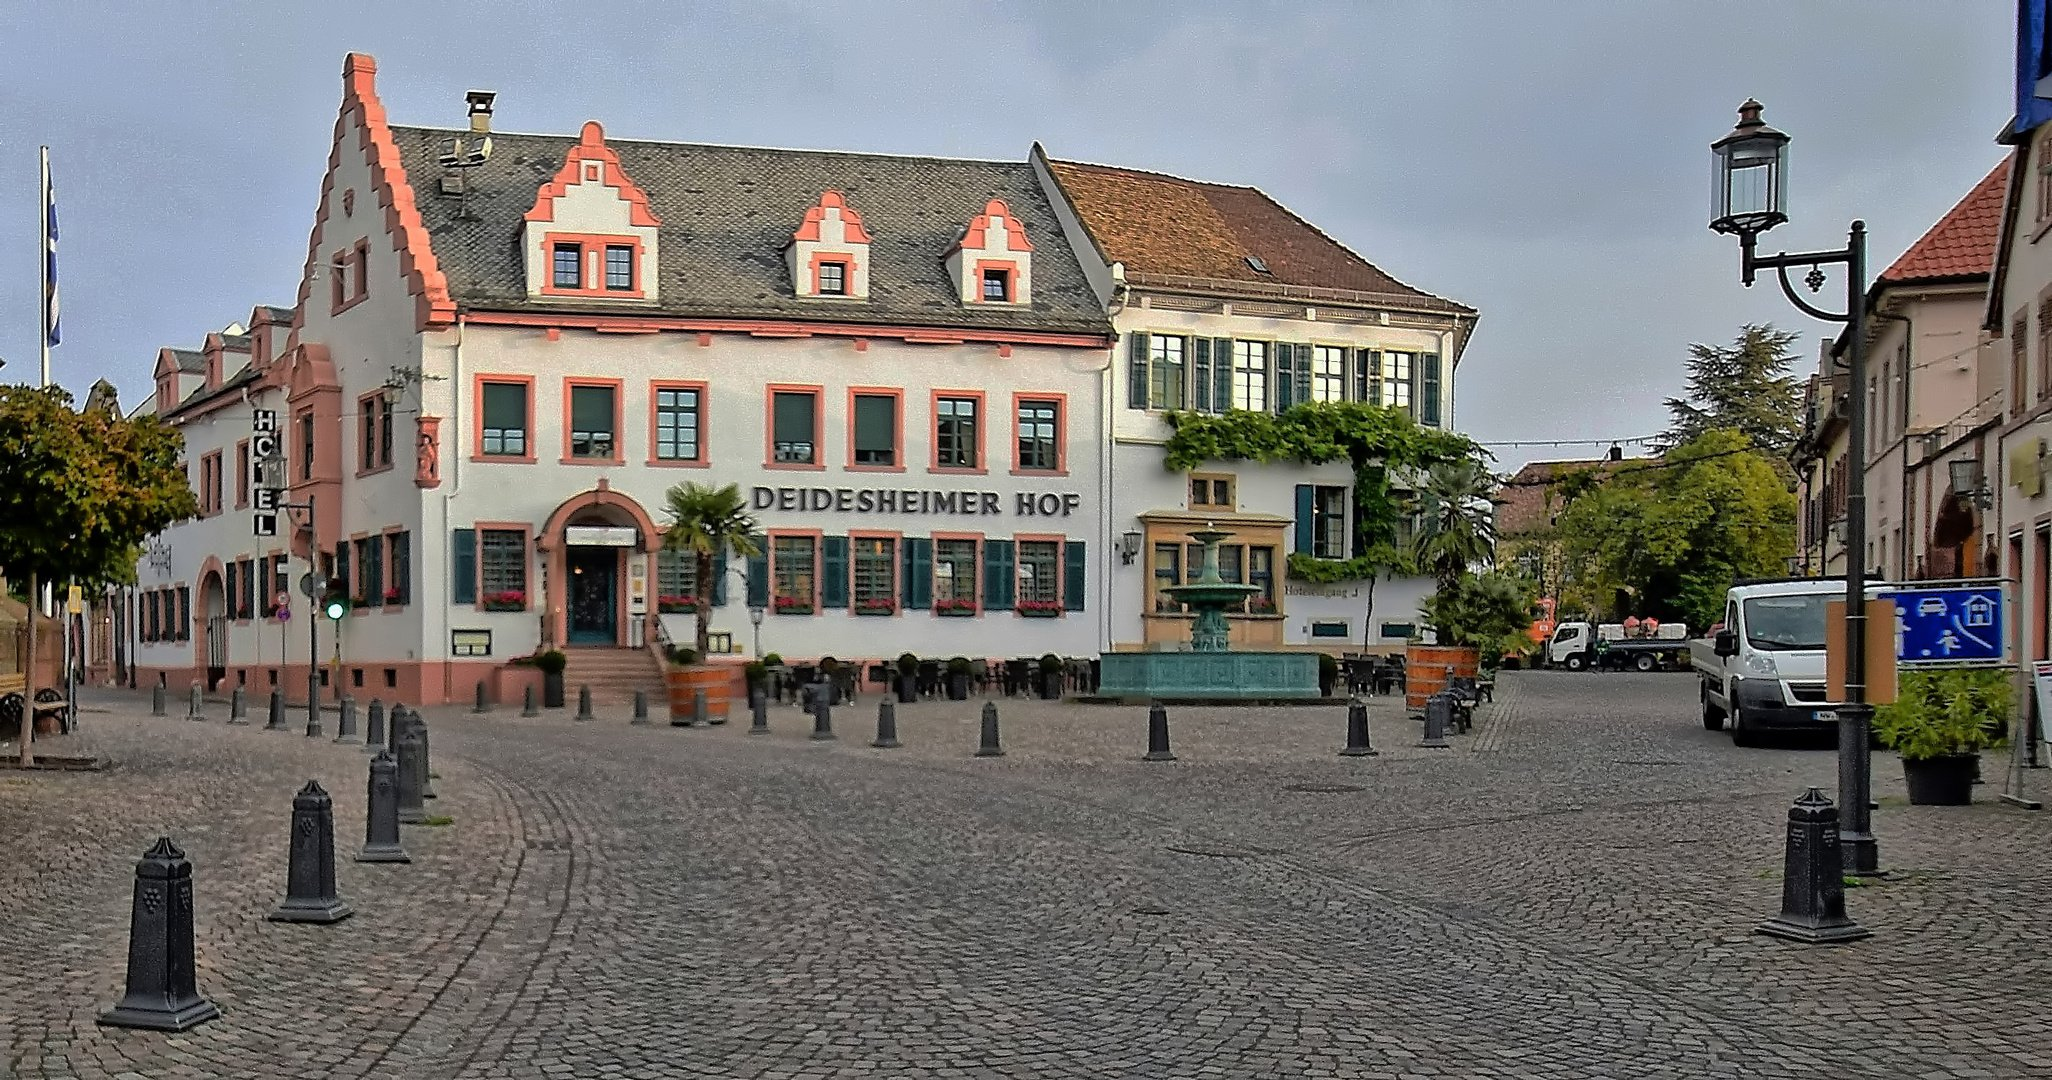 Deidesheimerhof